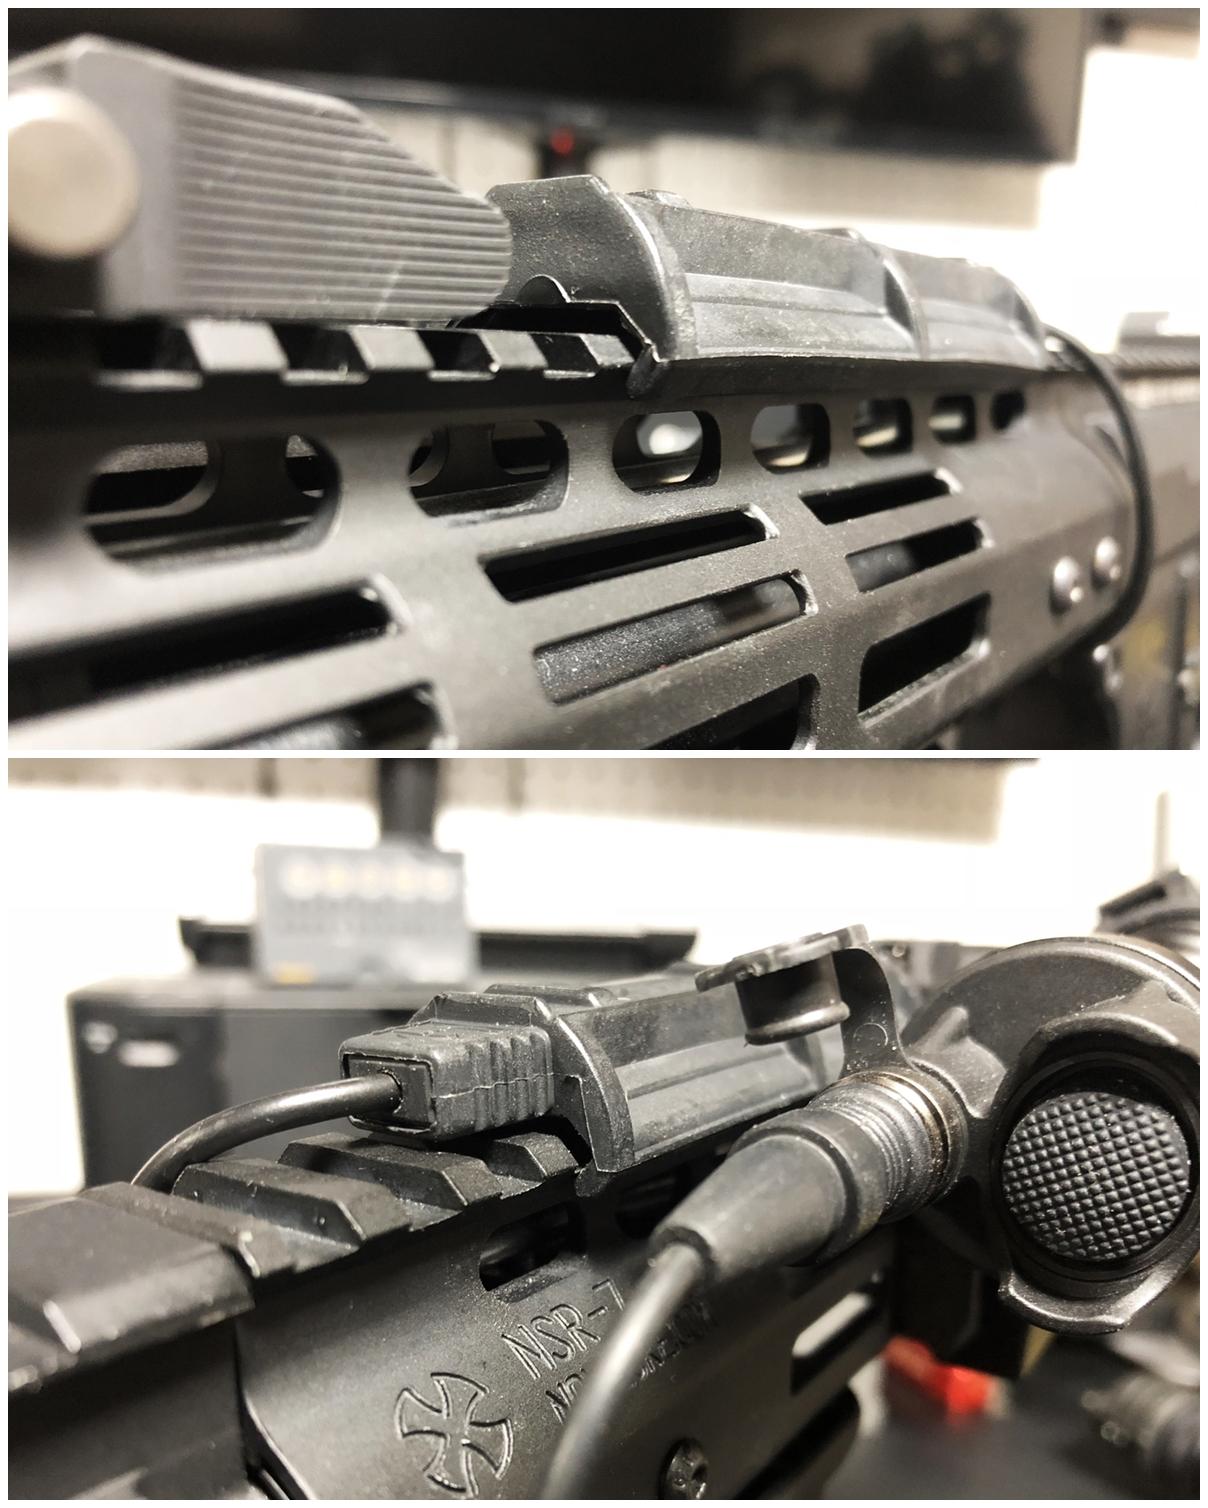 11 SUREFIRE TYPE REMOTE DUAL SWITCH 7 SR07 M720V シュアファイア M952V リモートデュアルスイッチ カスタム 購入 開封 取付 実物 レプリカ 比較 レビュー